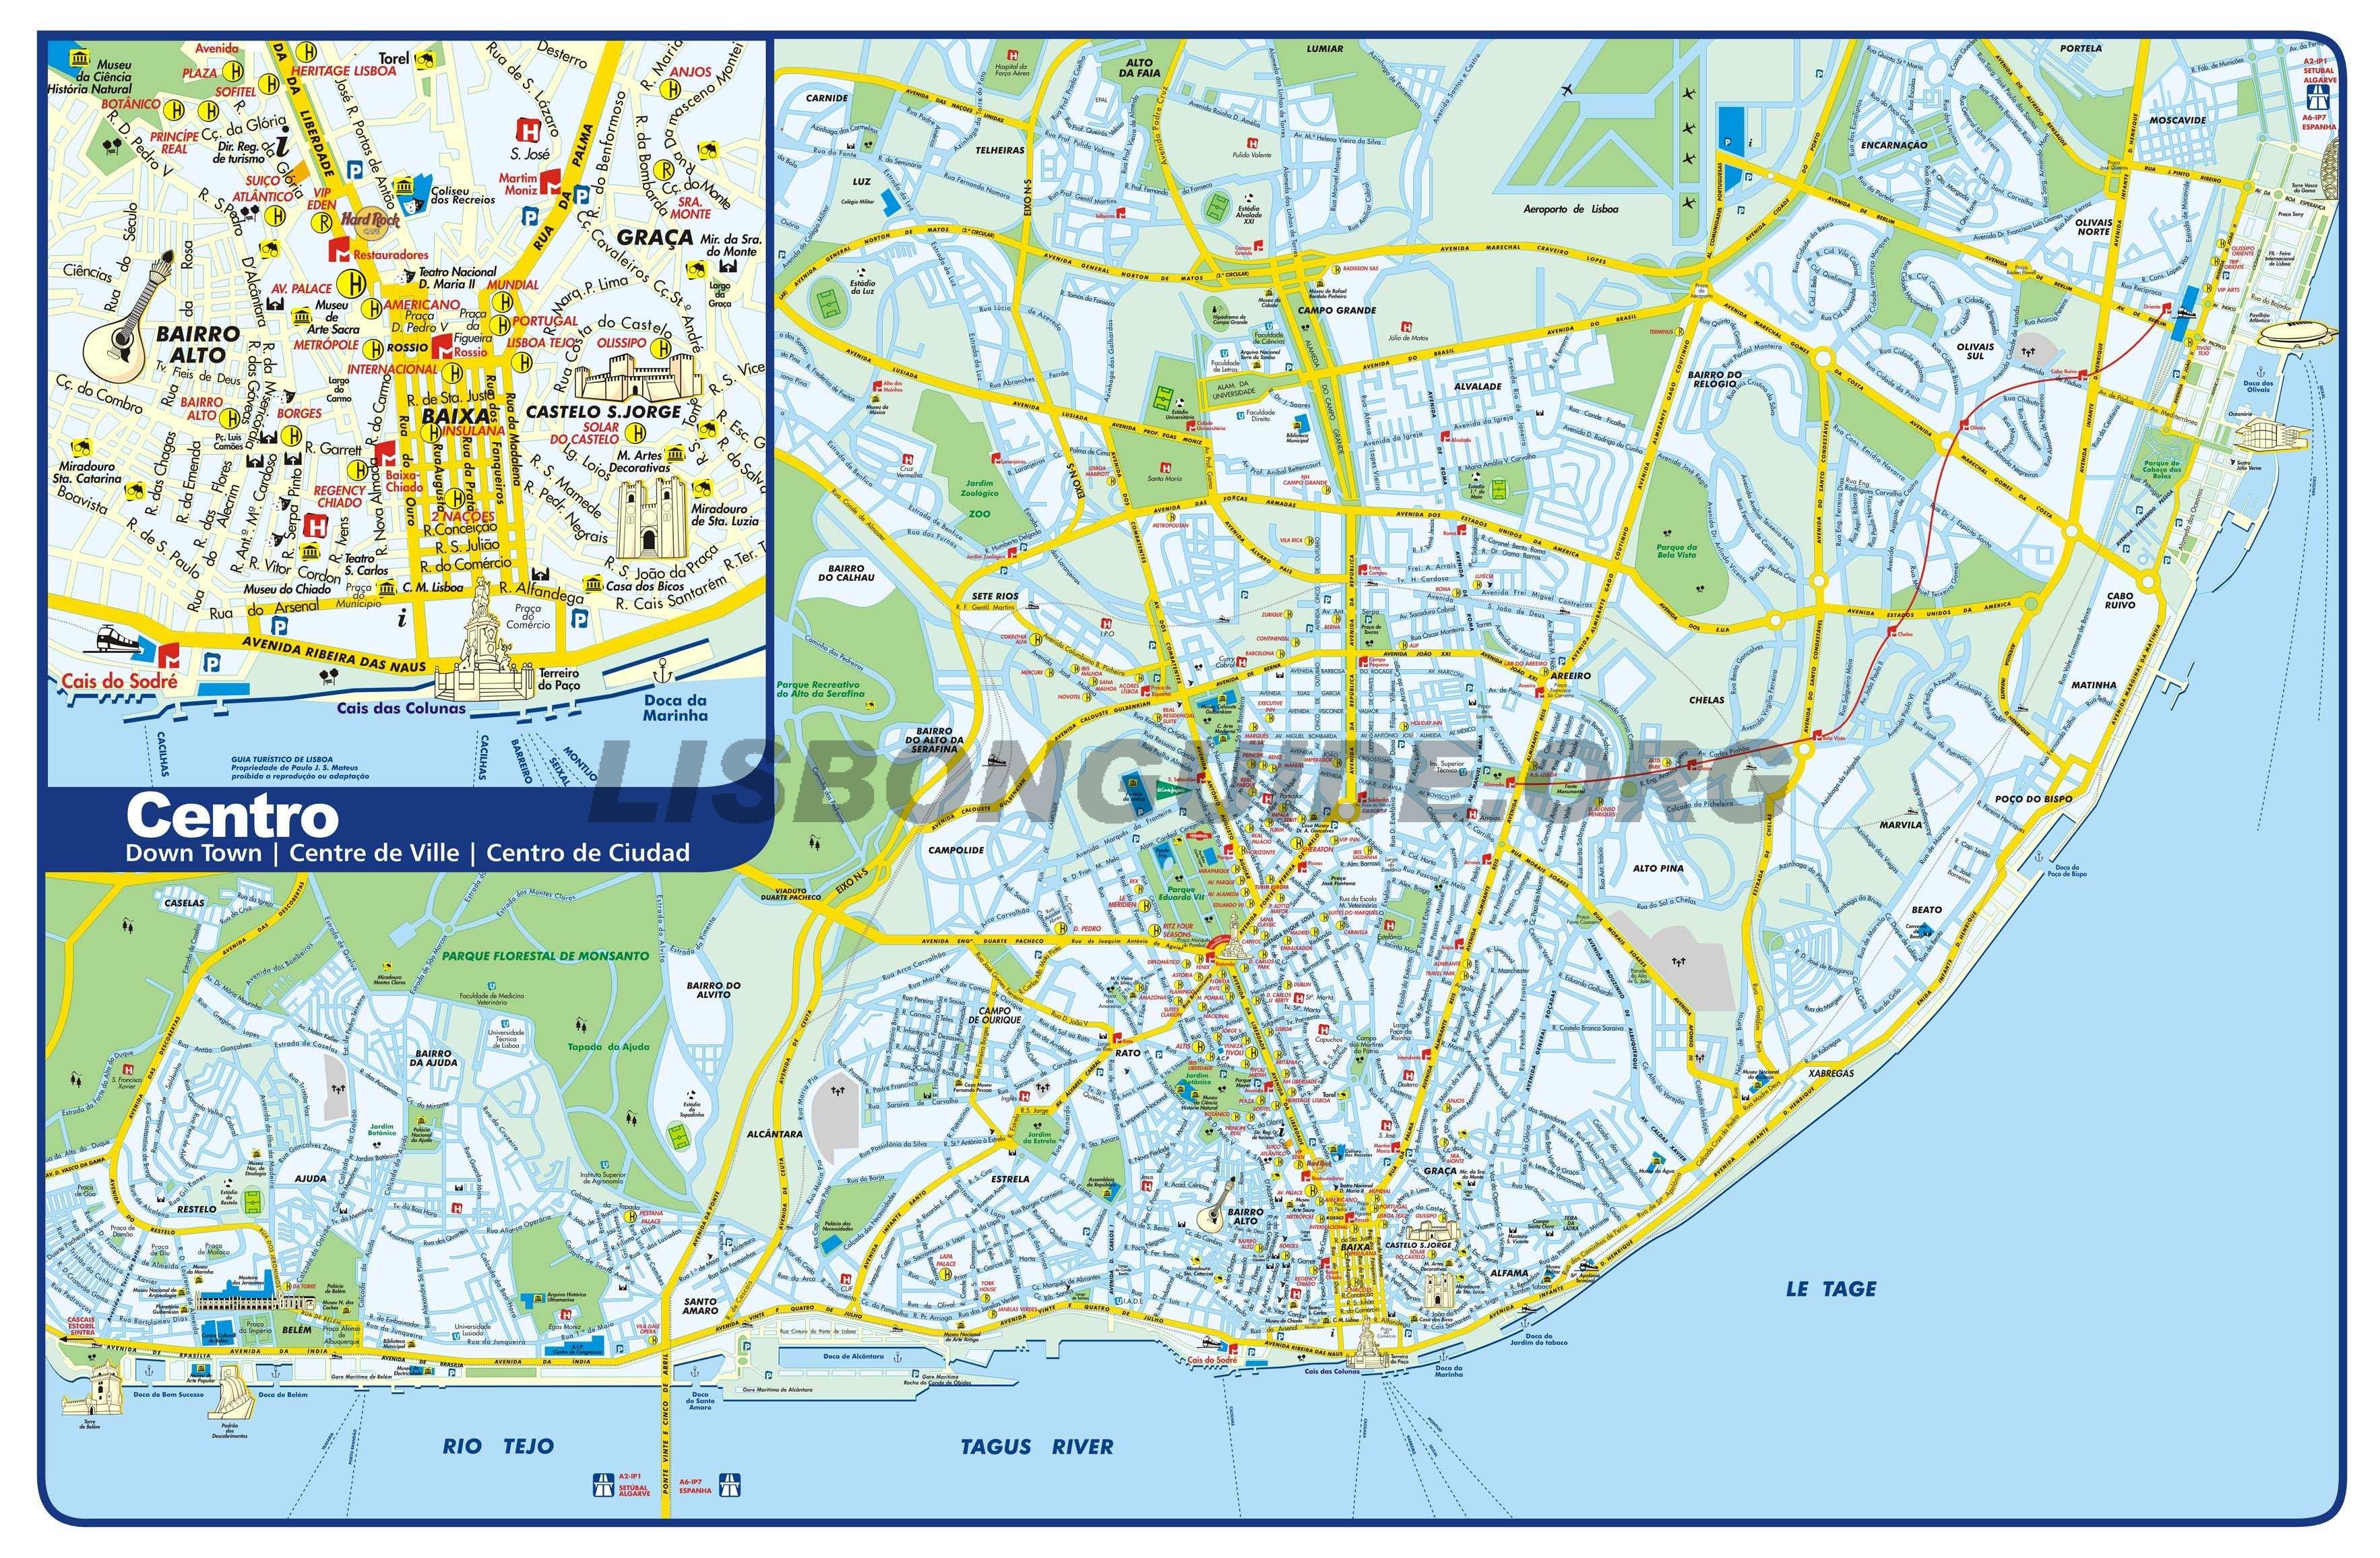 Mapa Turistico Lisboa Pdf.Mapa Gratuito De Lisboa 2020 Actualizado La Mejor Guia